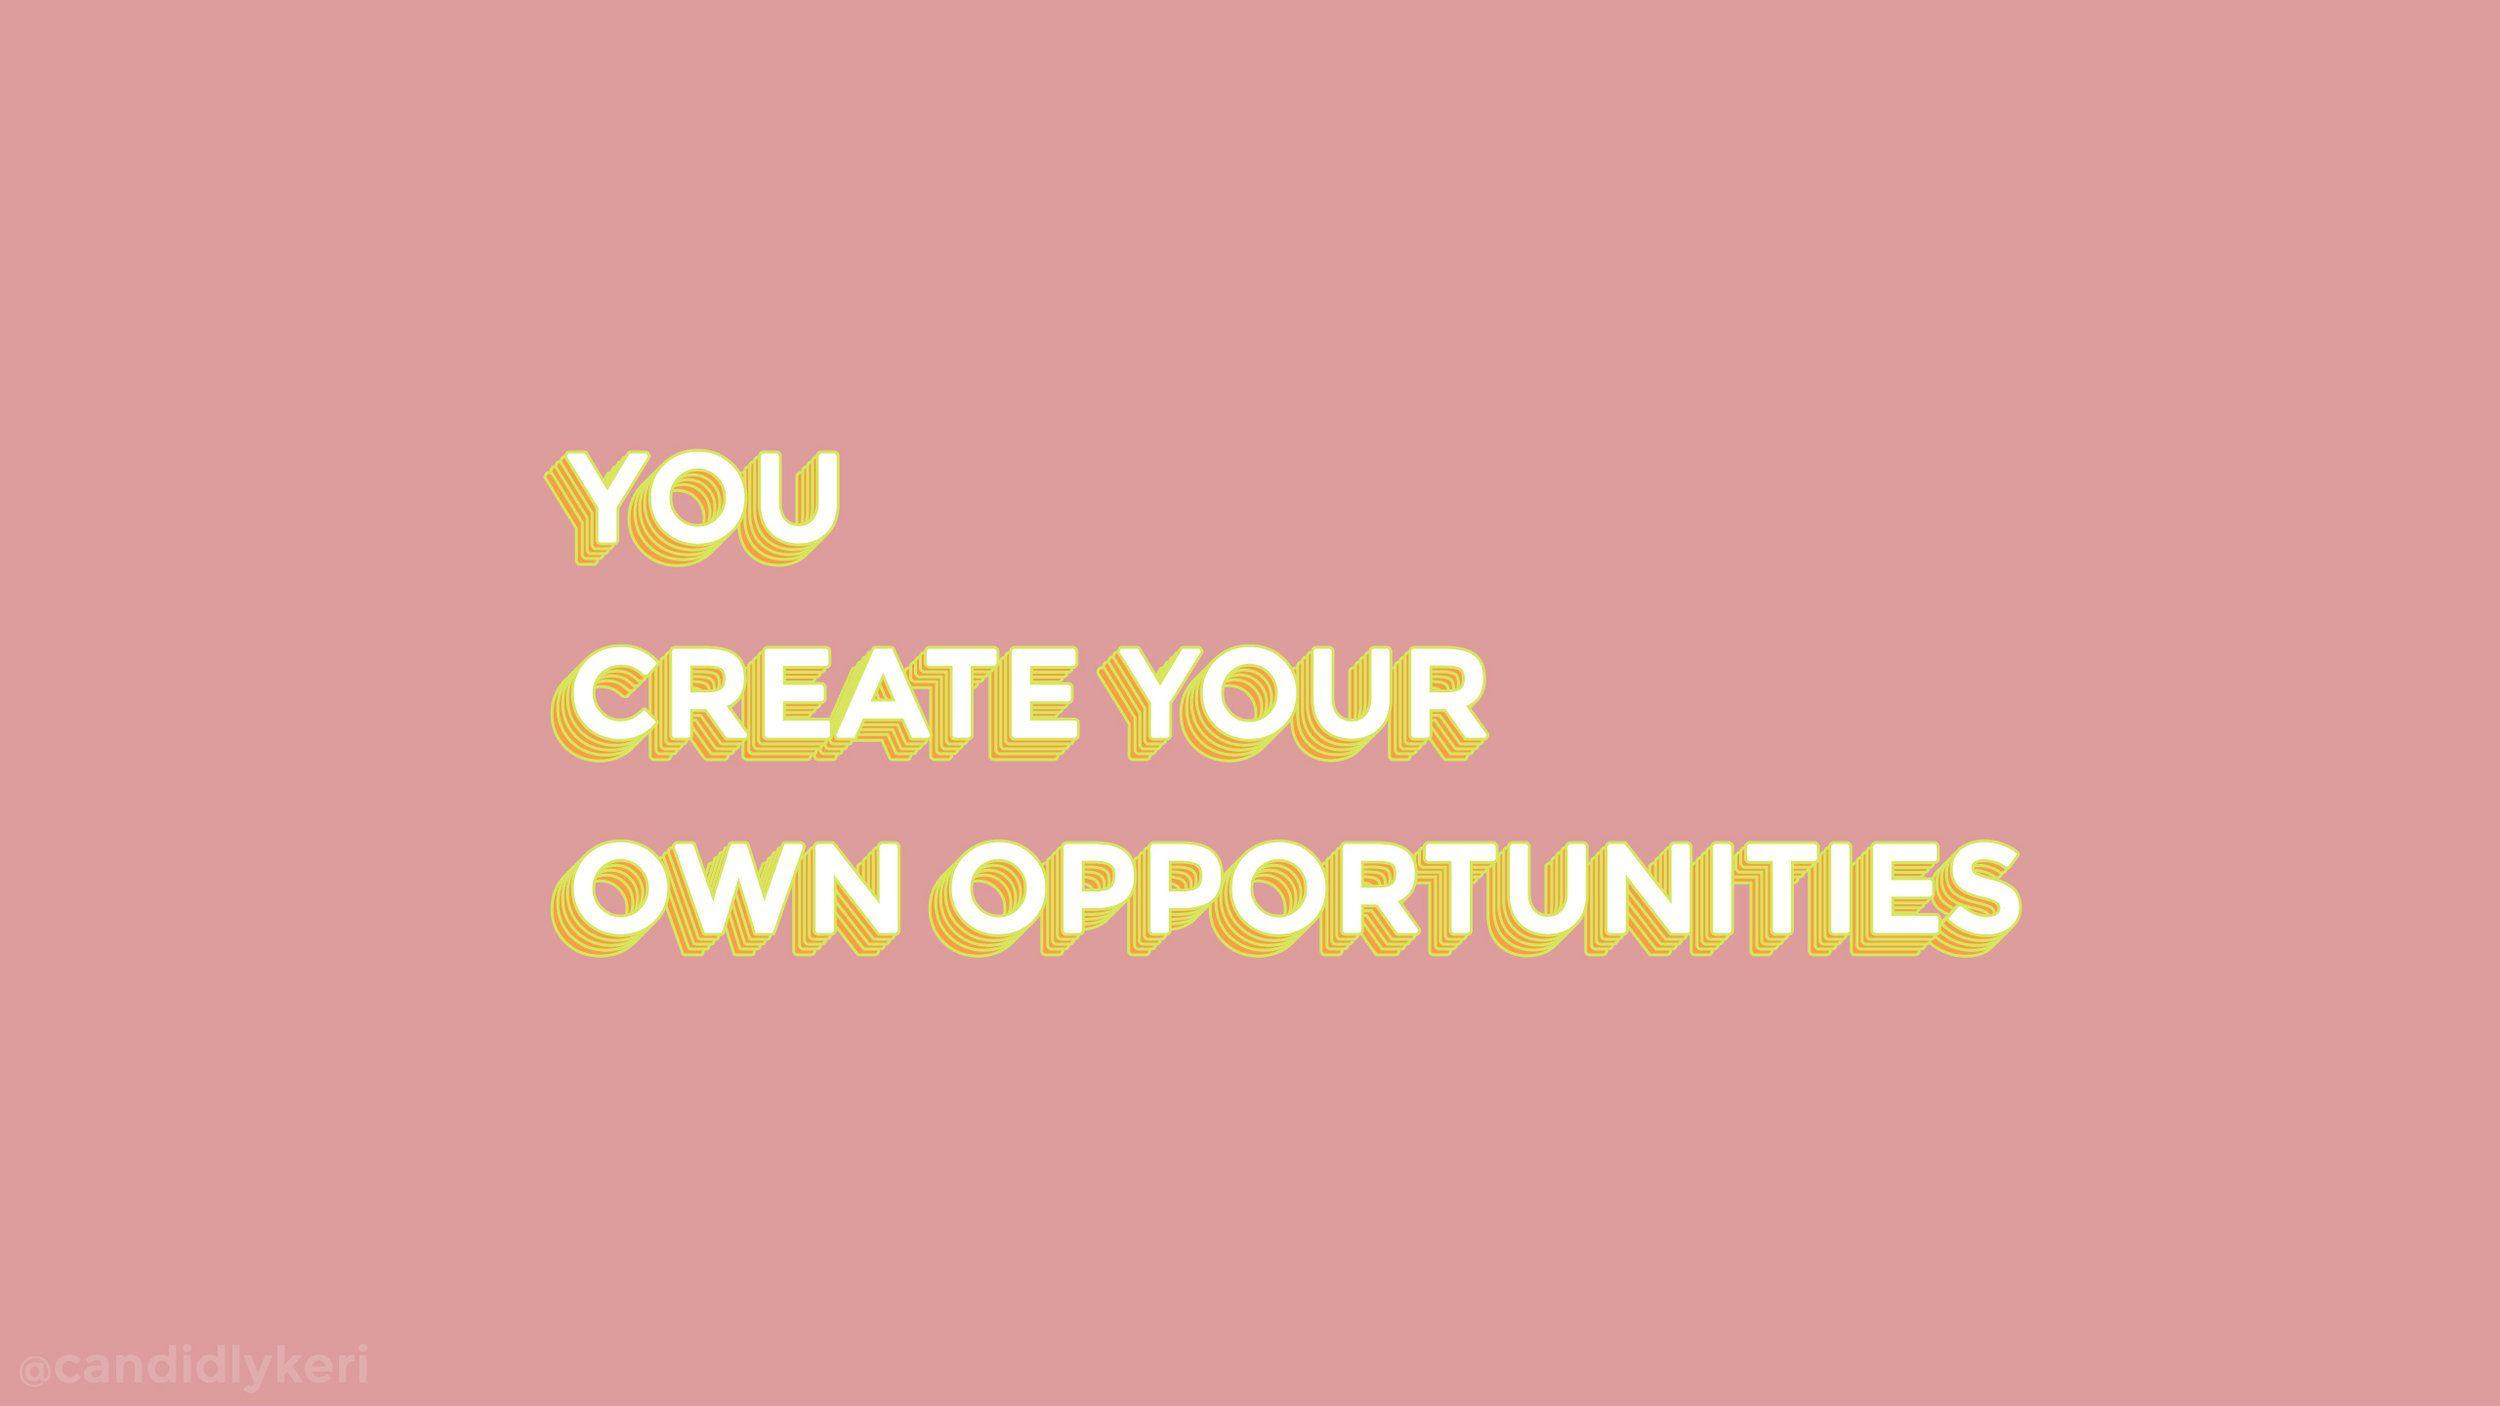 You Create Your Own Opportunities Desktop Wallpapers Para Pc Papel De Parede Computador Papel De Parede Do Notebook